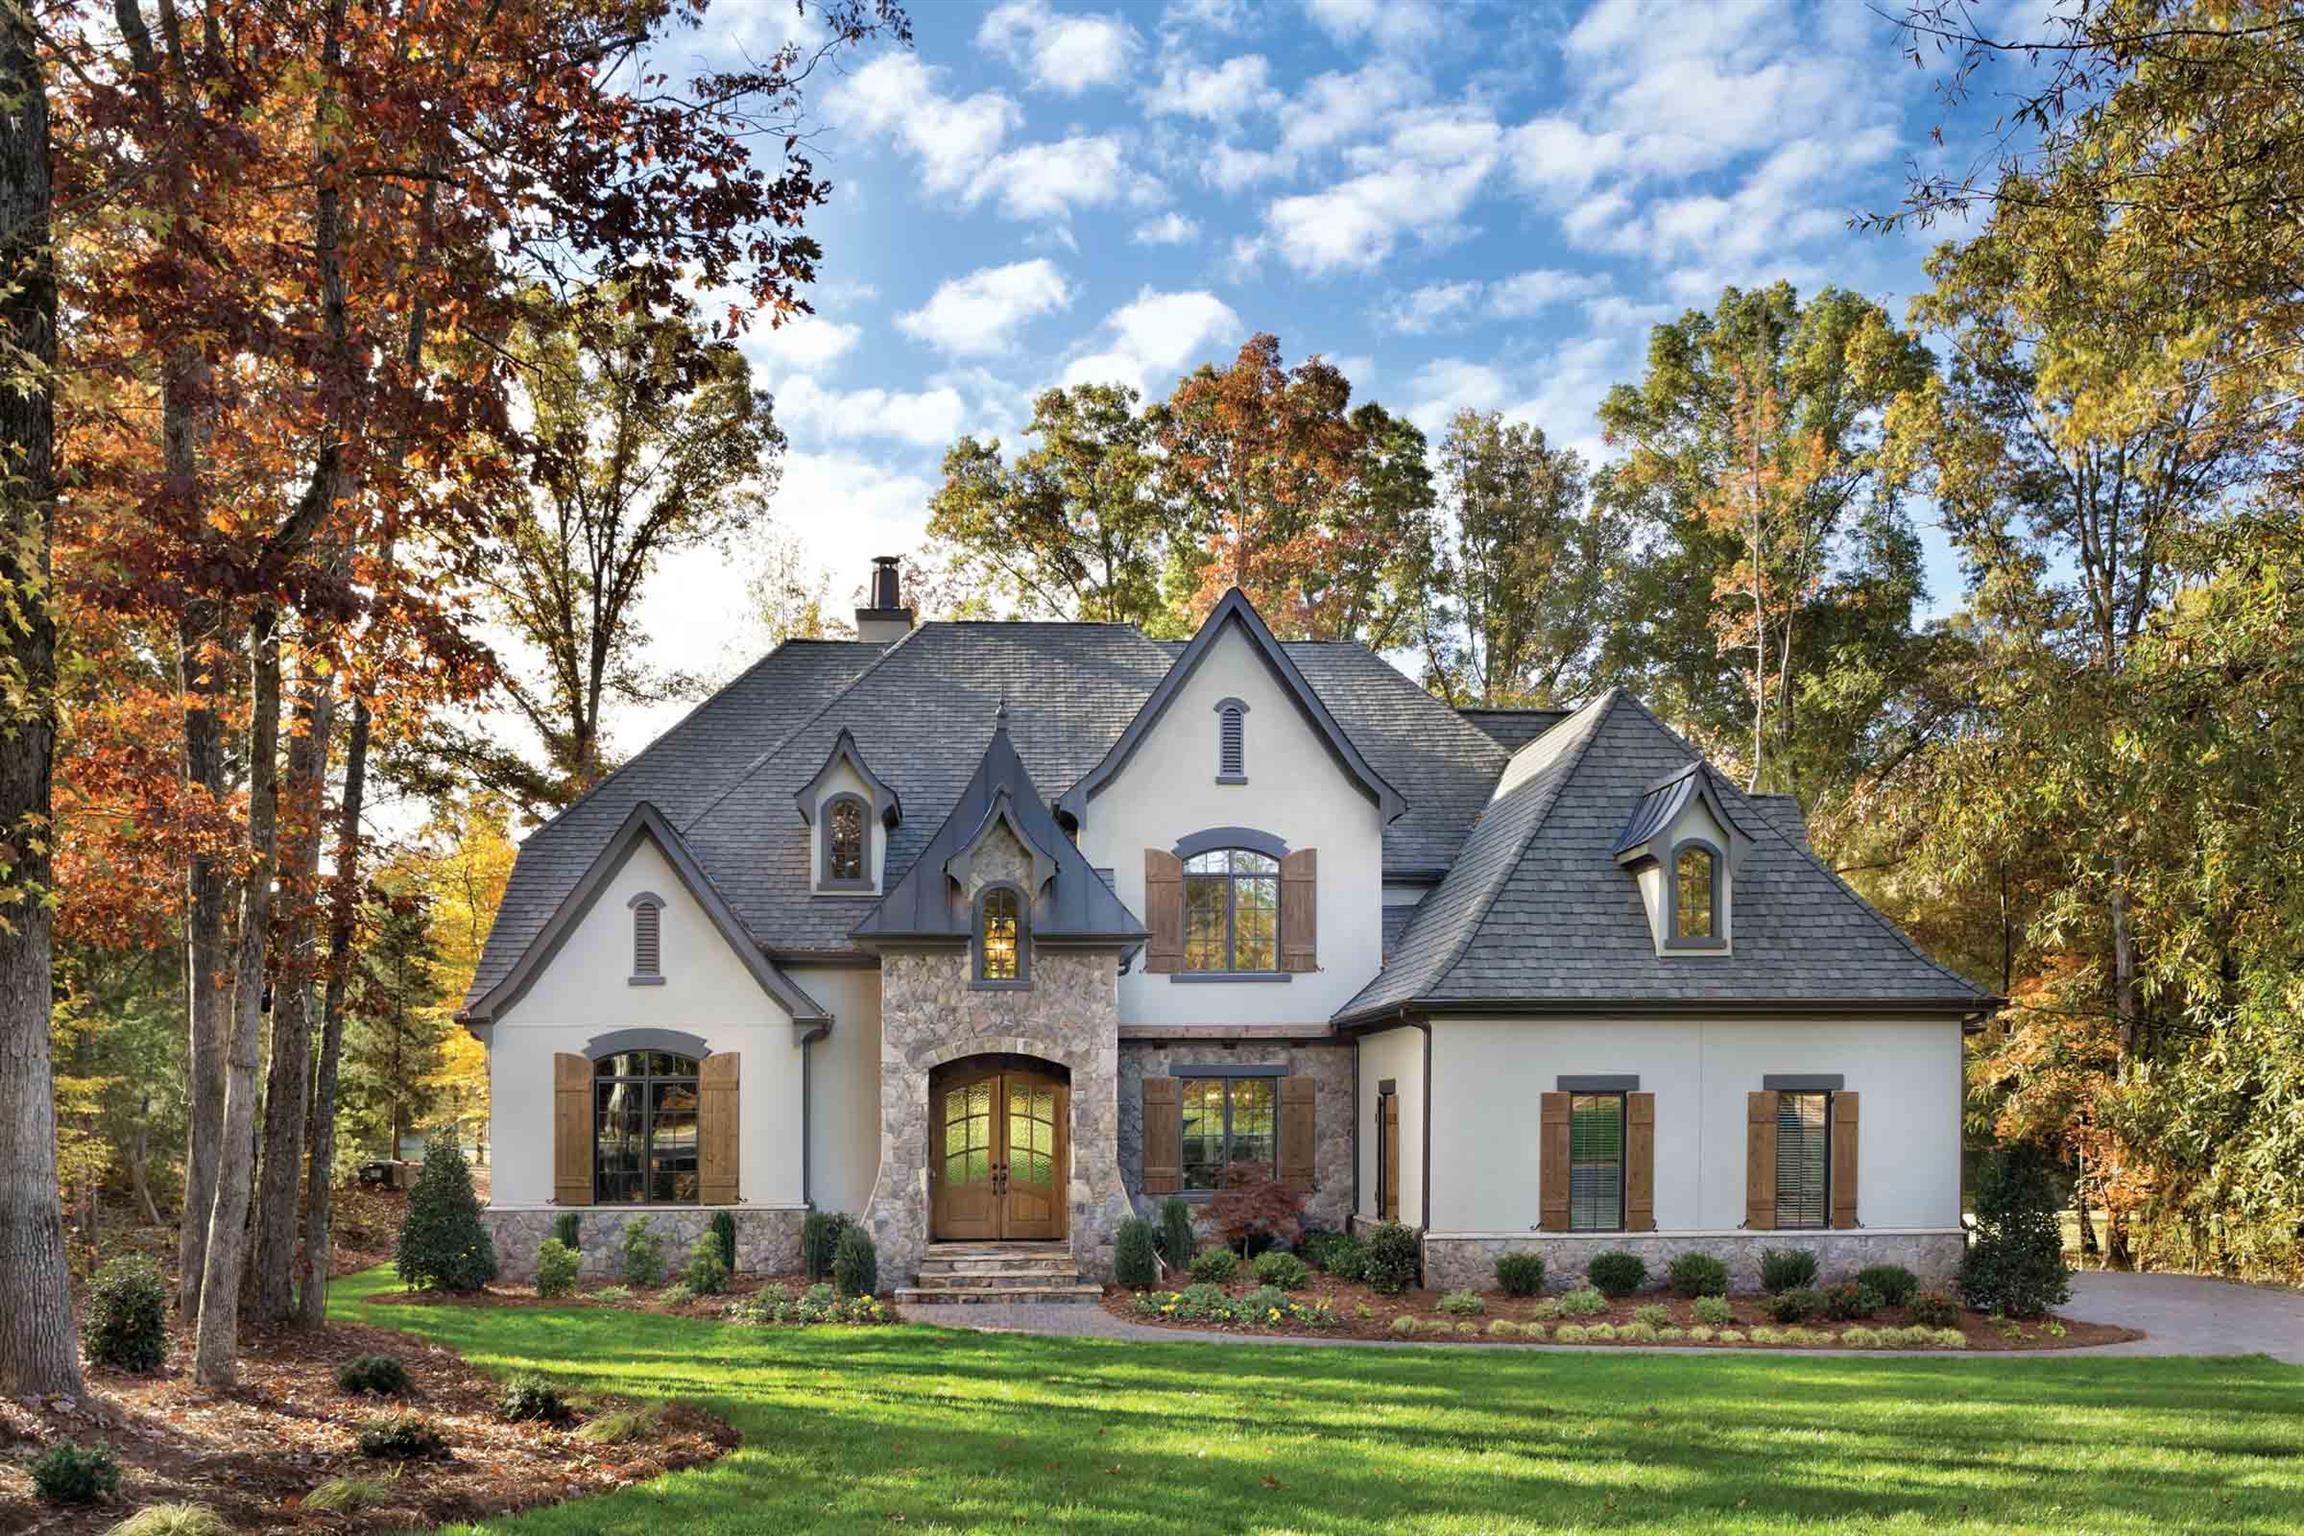 1188 Potter Ln, Gallatin, Tennessee